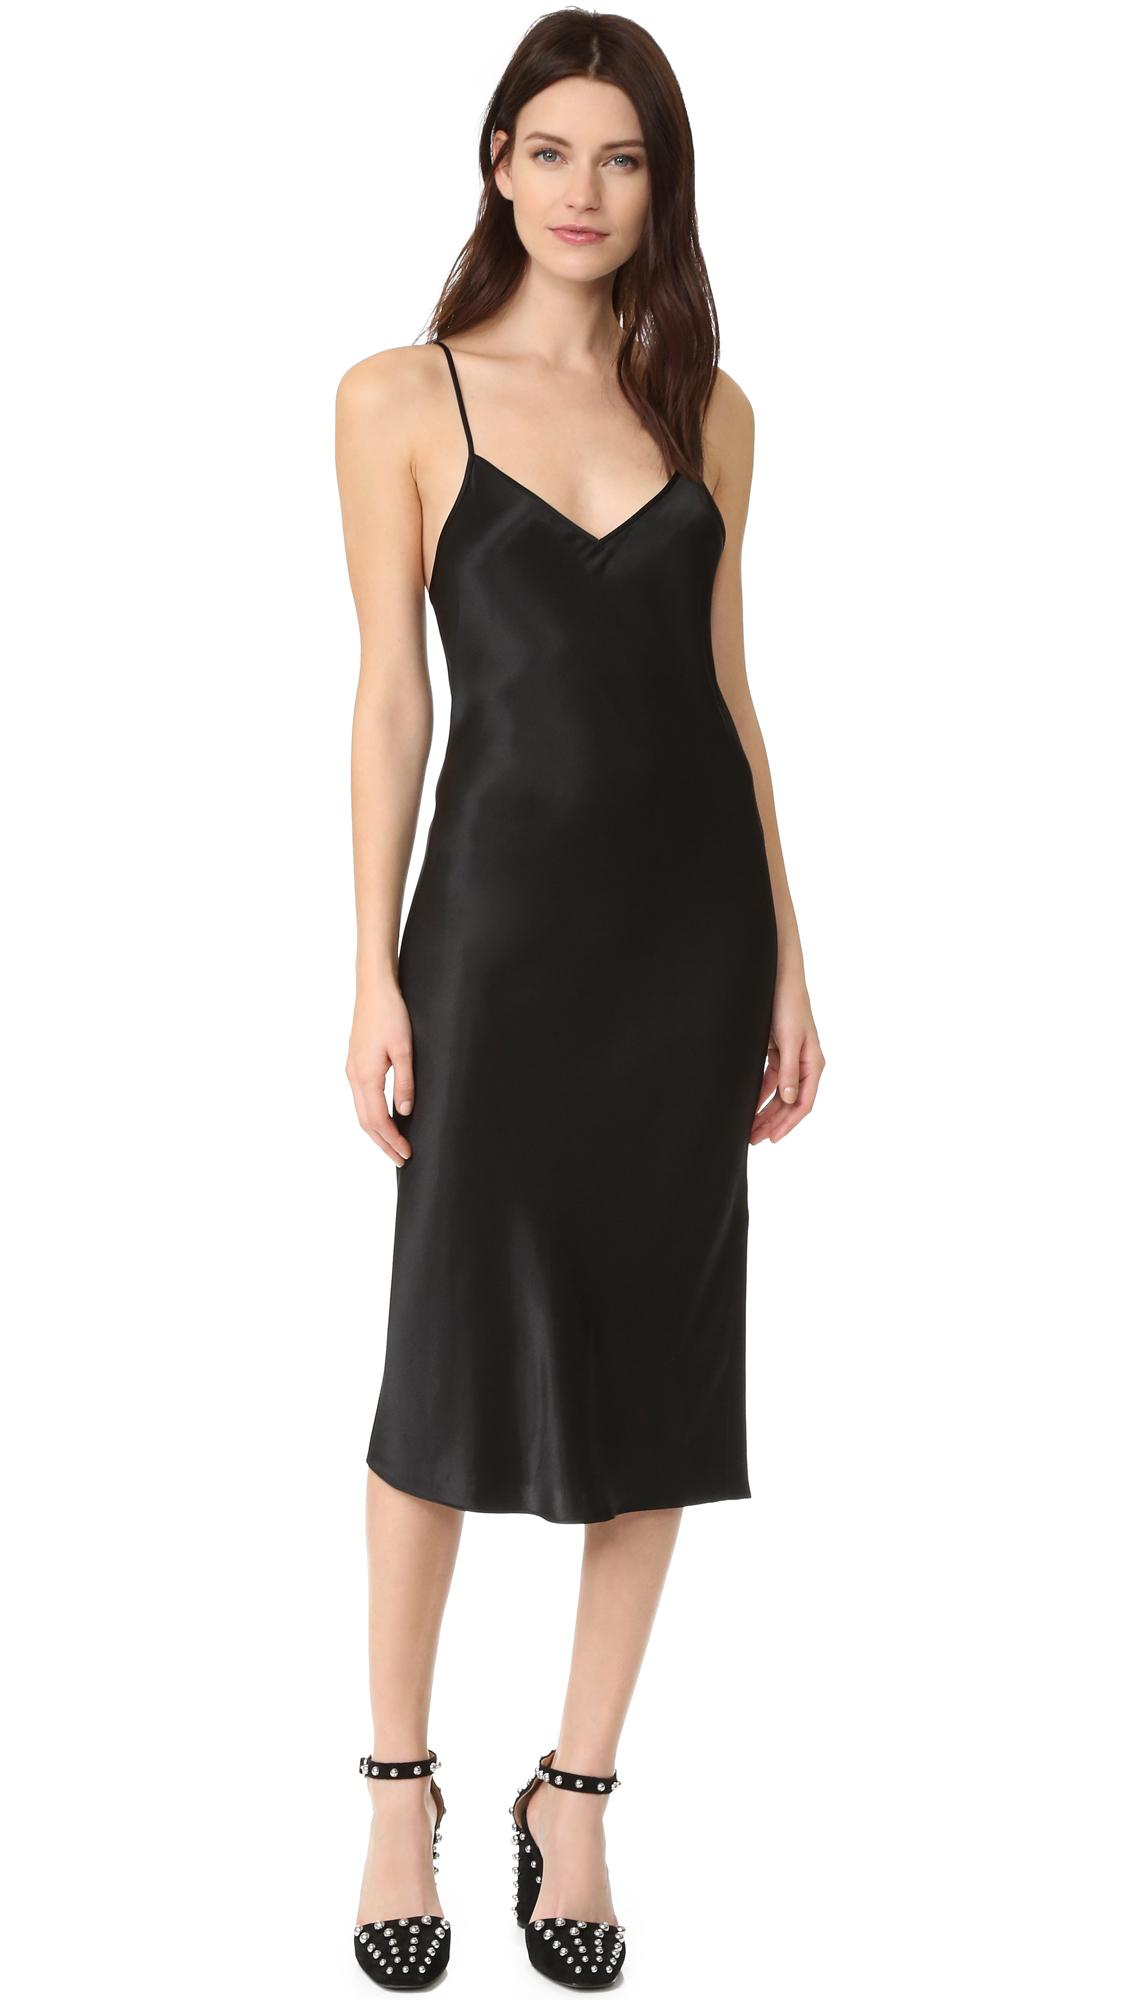 Dkny Sleeveless Slip Dress - Black at Shopbop